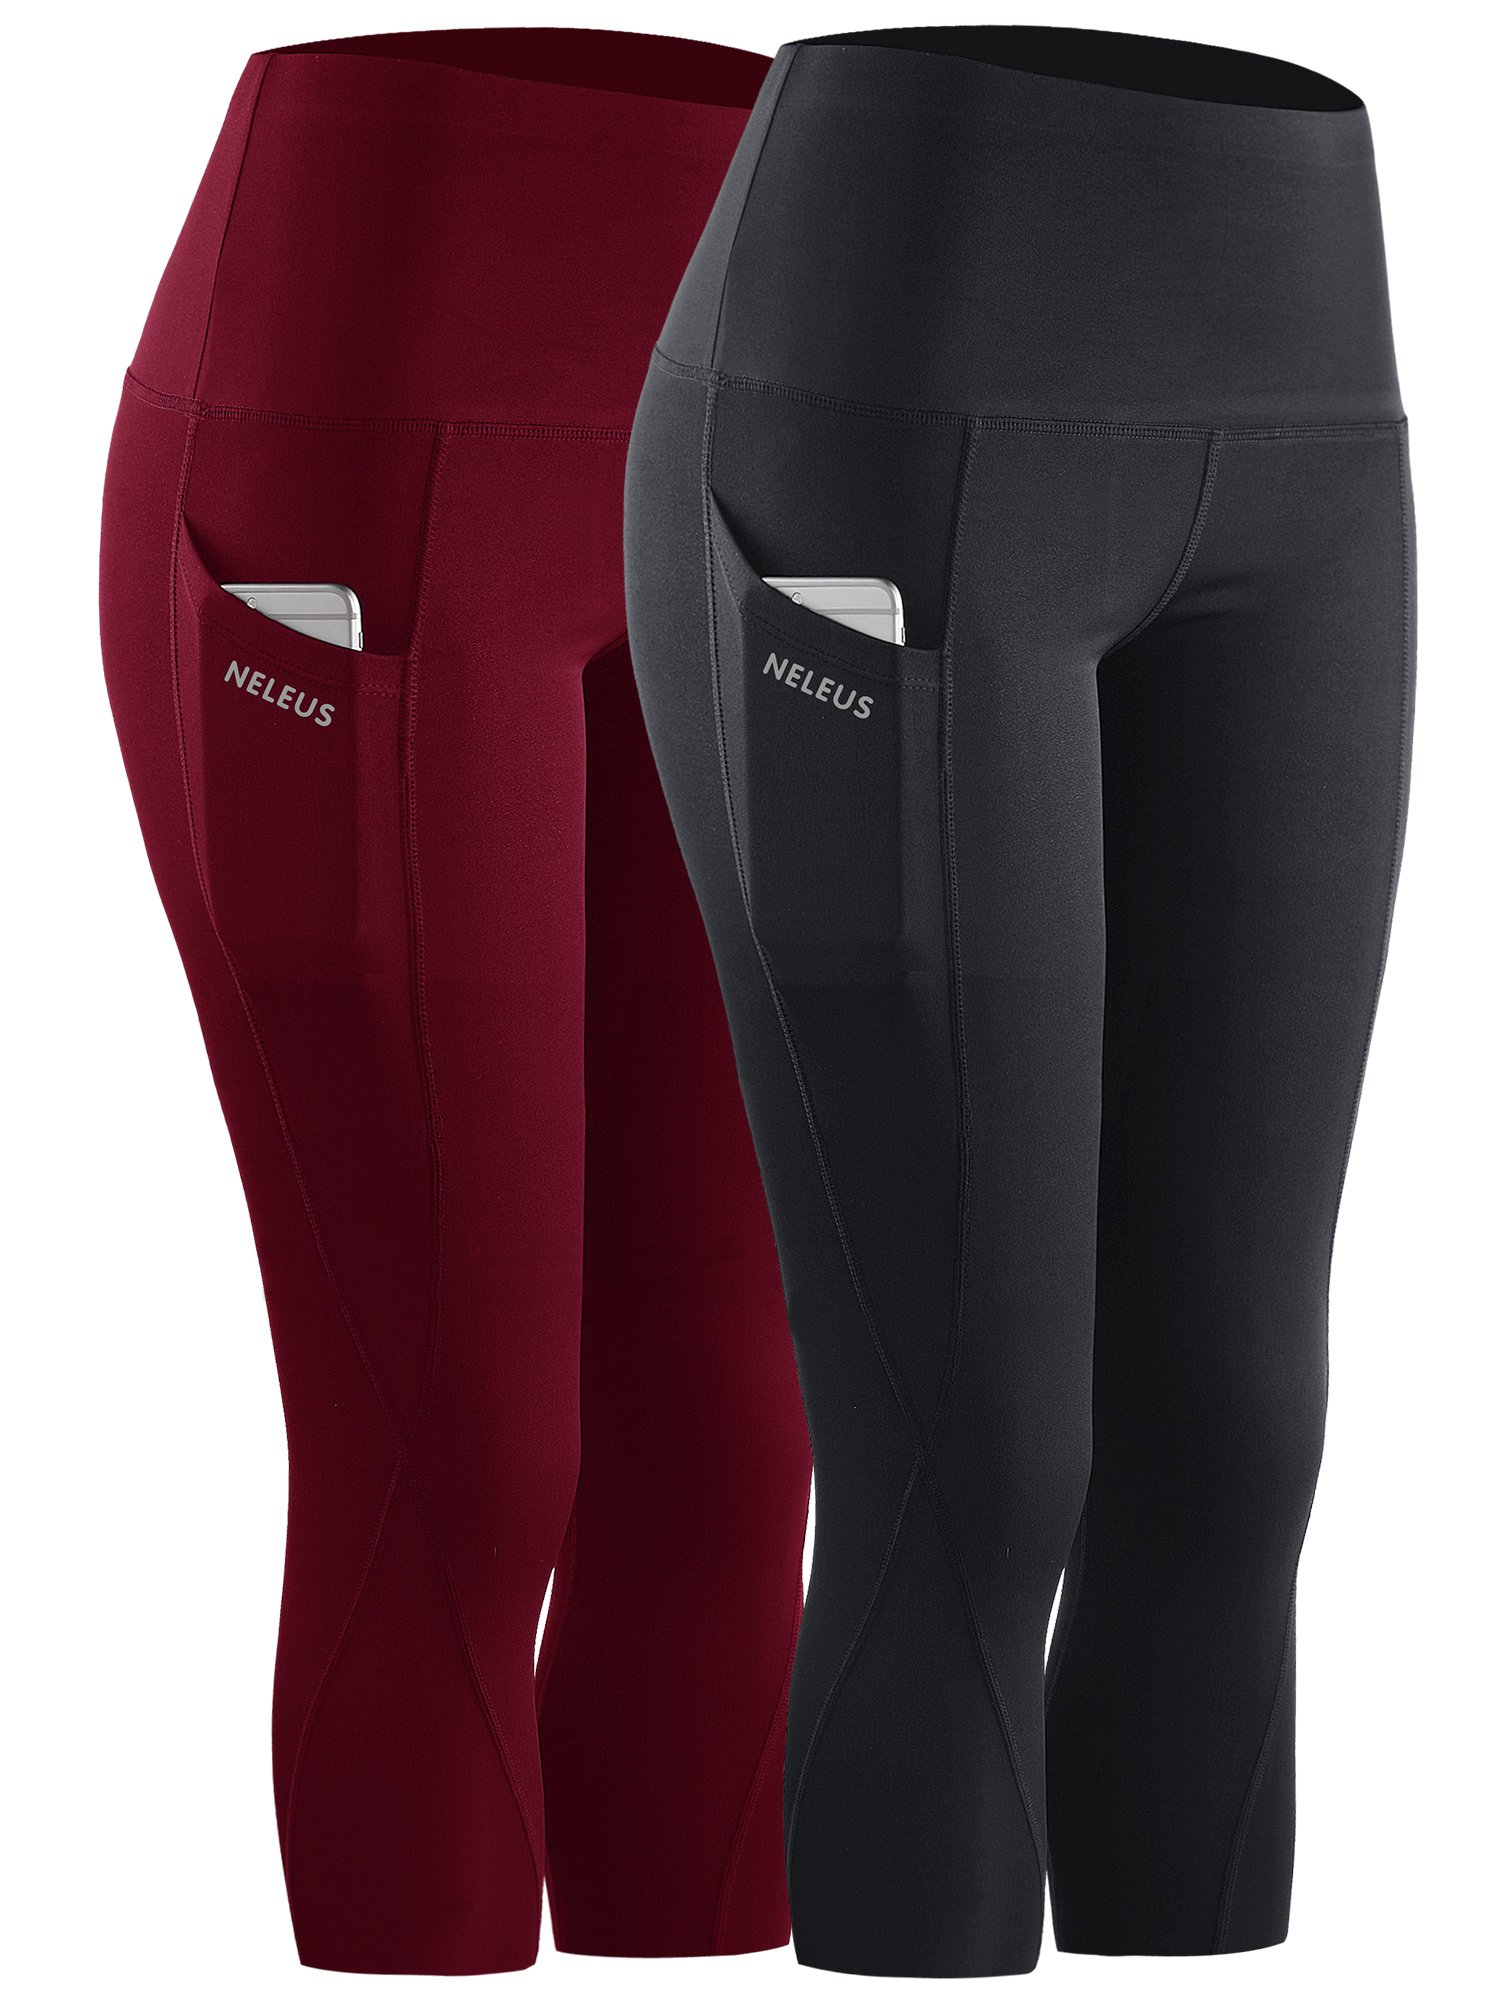 Neleus 2 Pack Tummy Control High Waist Workout Yoga Capri Leggings,9027,Black,Dark red,US S,EU M